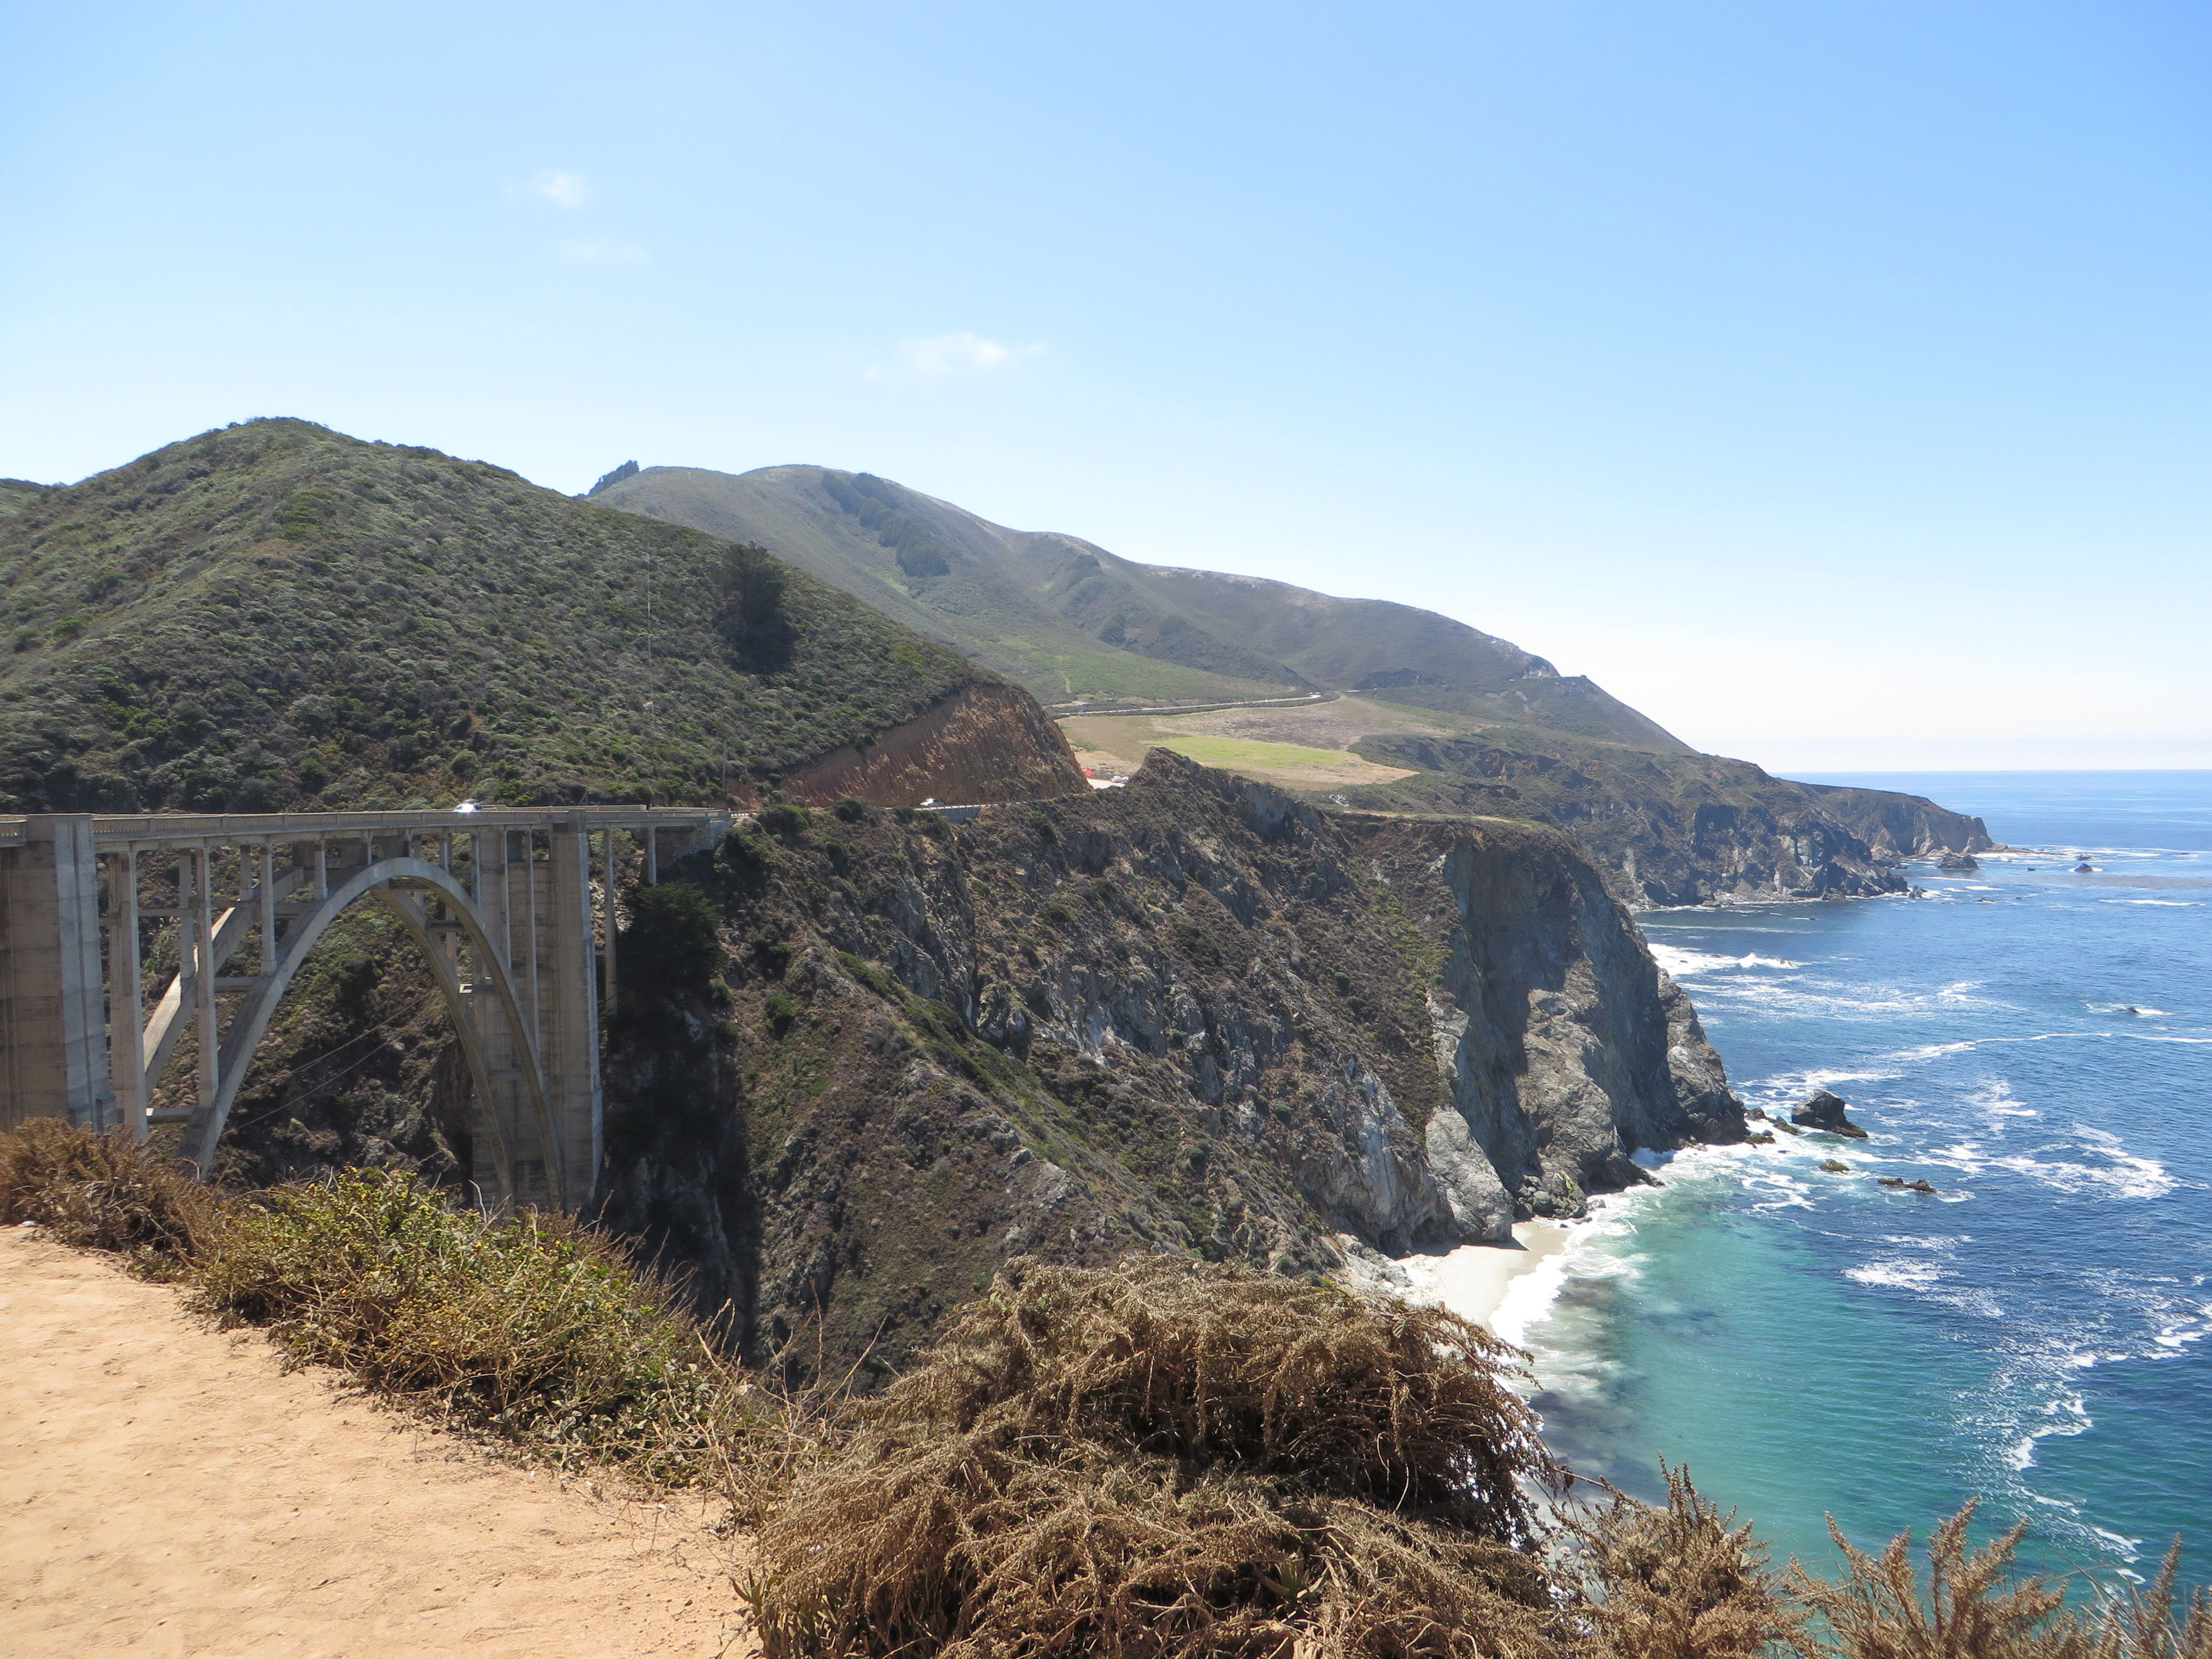 Bixby Bridge, CA | Road trip - US west coast | Pinterest | Bridges ...